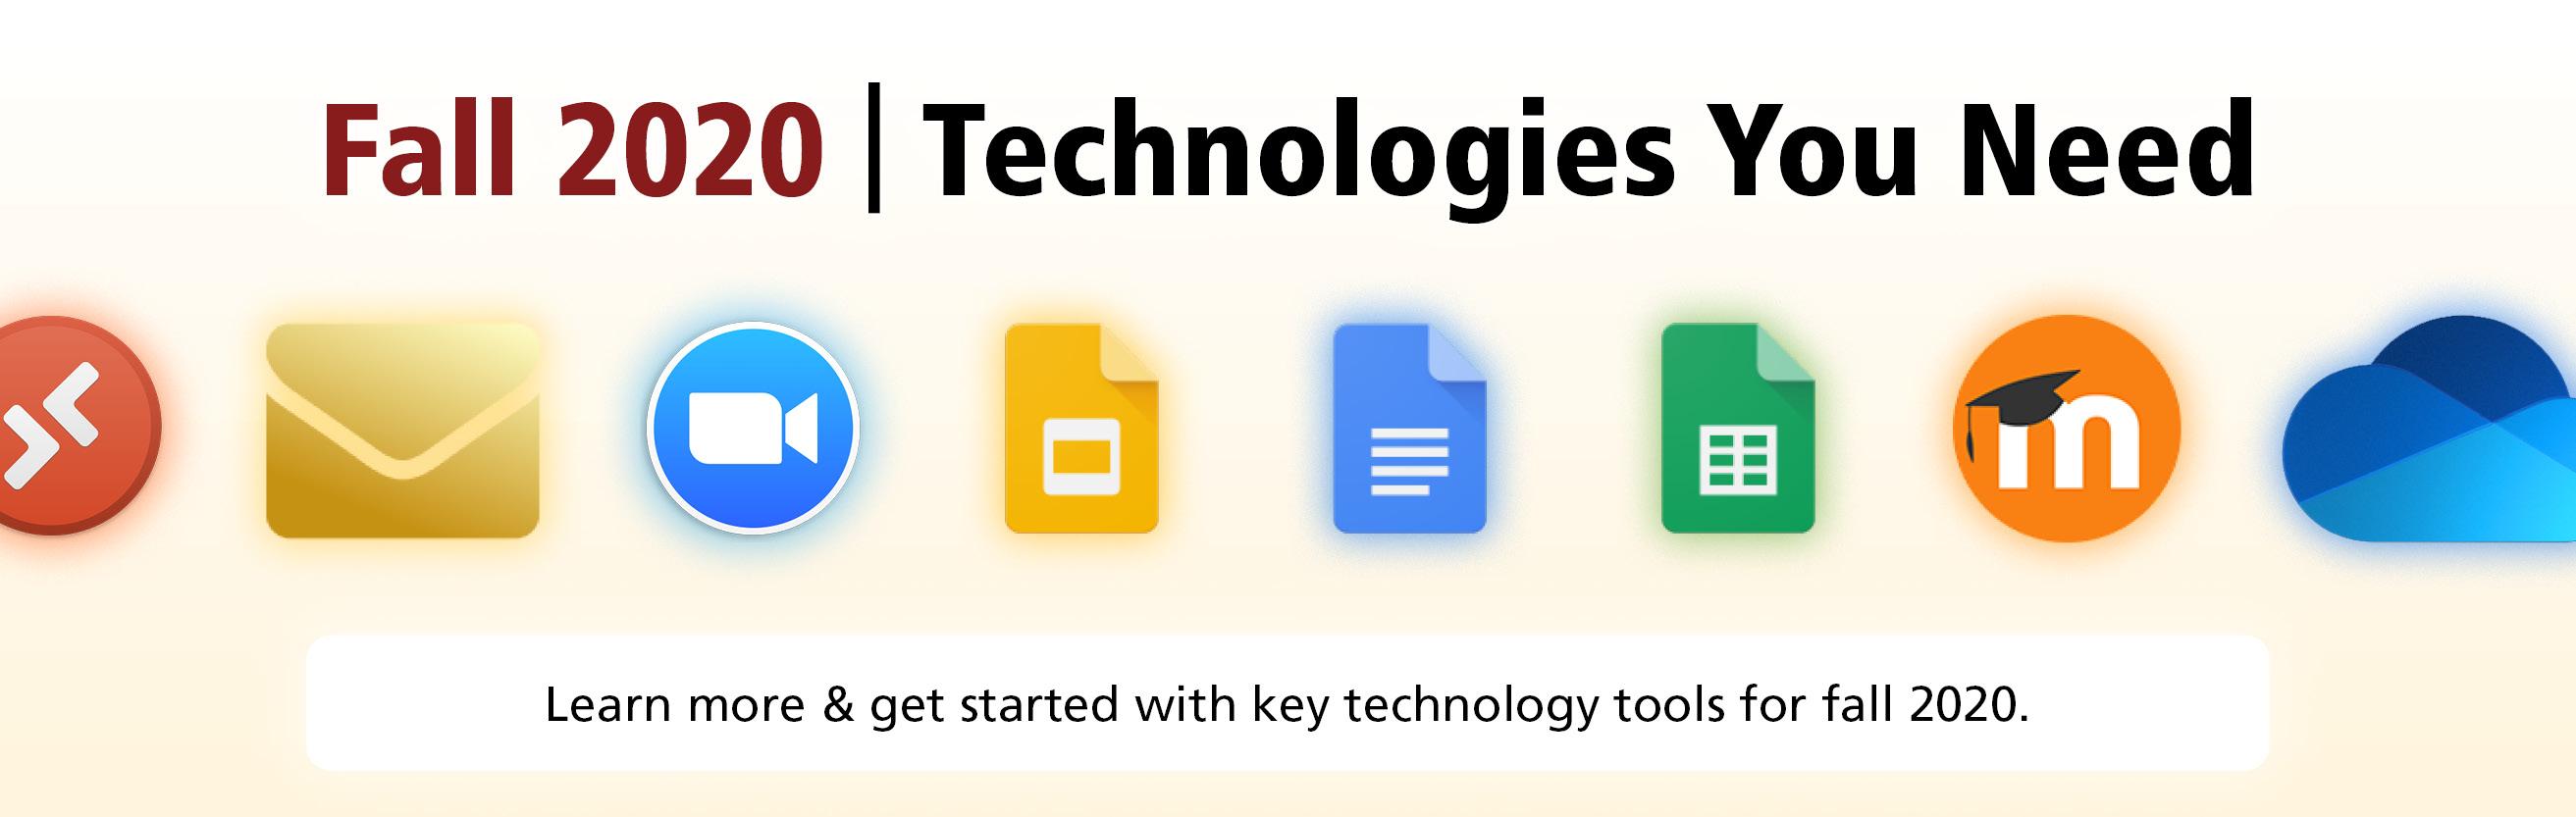 Fall 2020 Technologies You Need